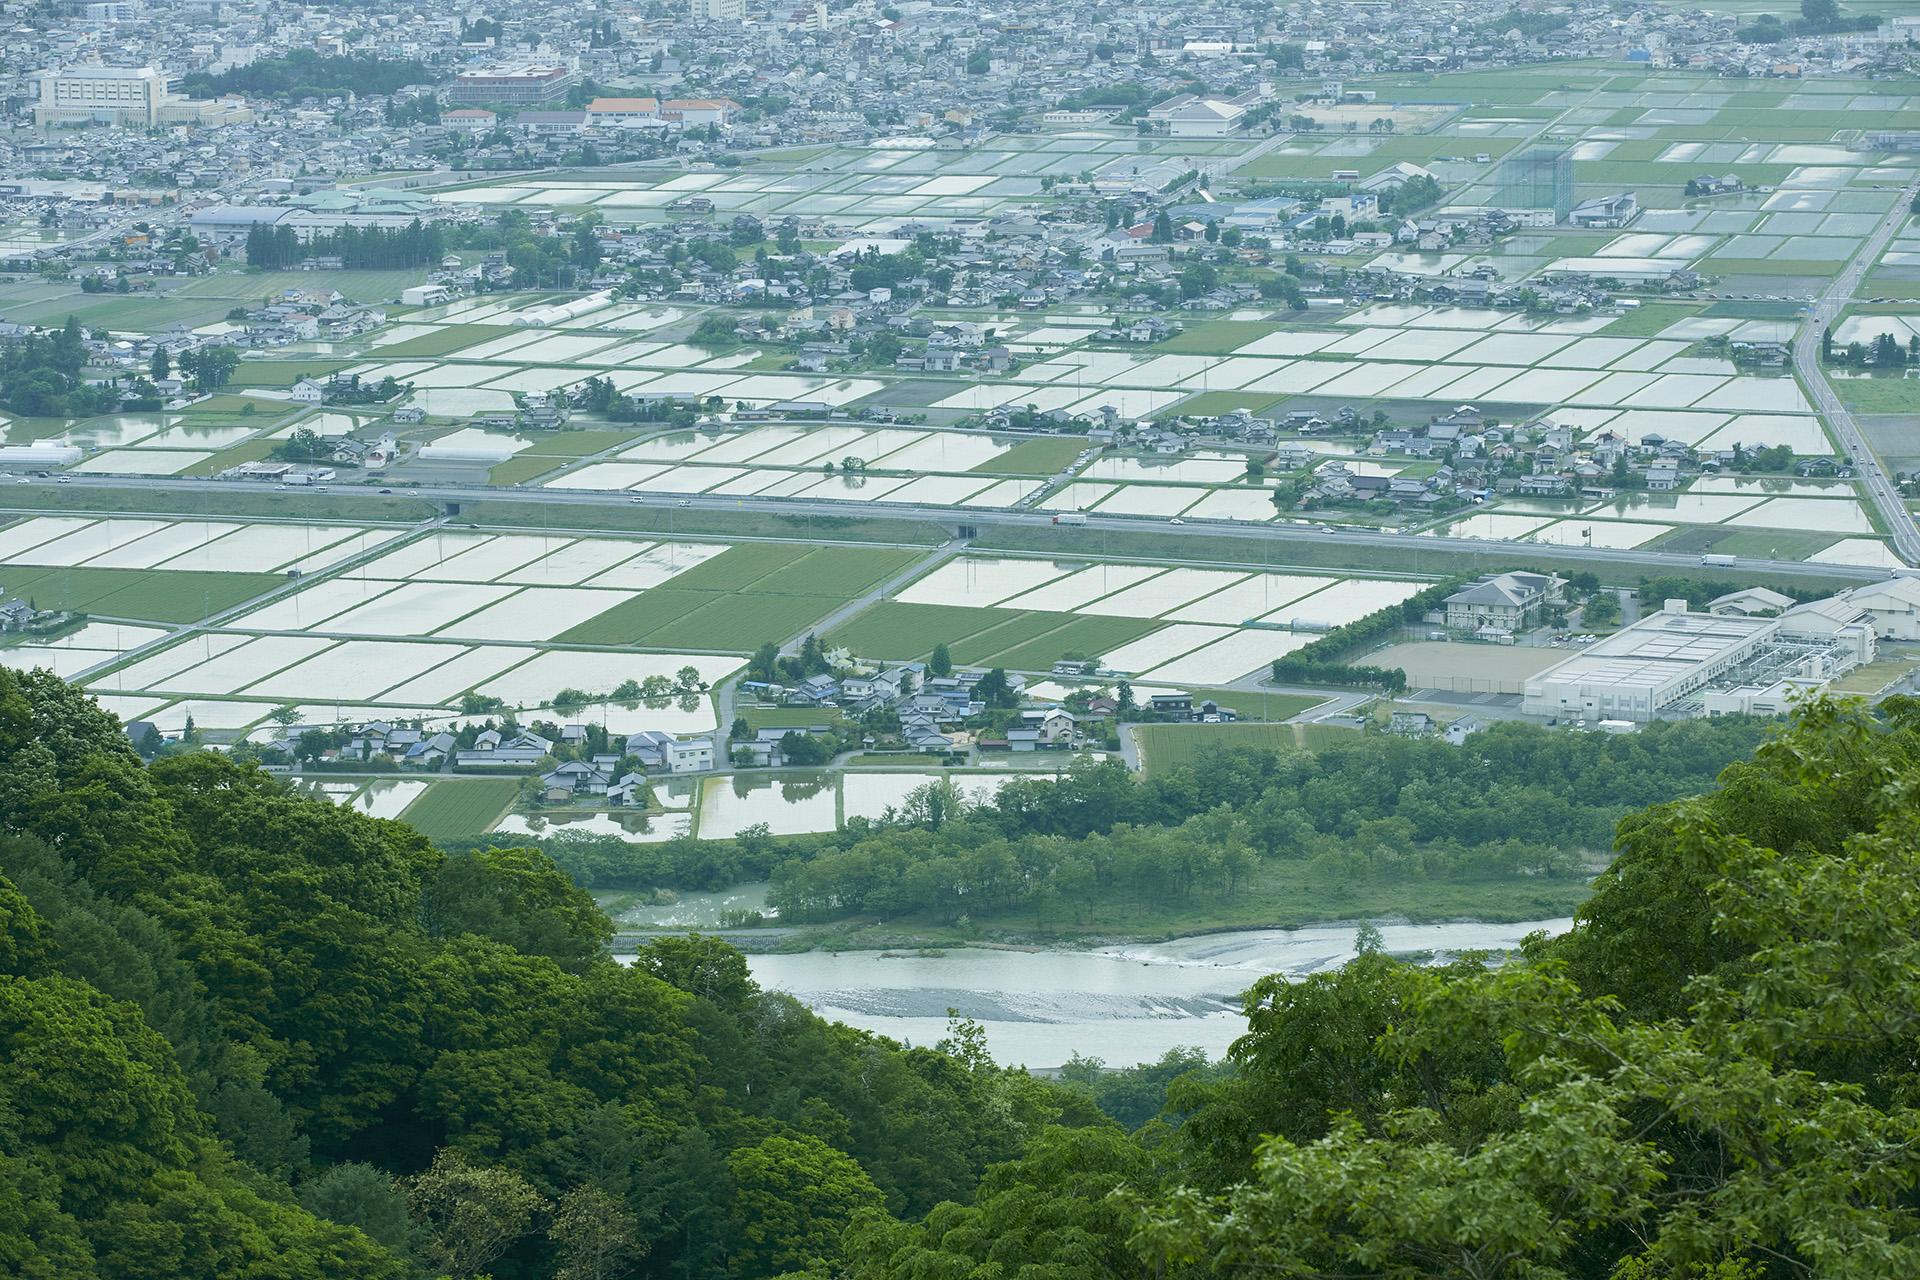 11-2 Daily Life of Athletes. In the Case of Tsutomu Sugisaka.<br> 2人の師から受け継いだ山との向き合い方<国際山岳ガイド・杉坂勉>